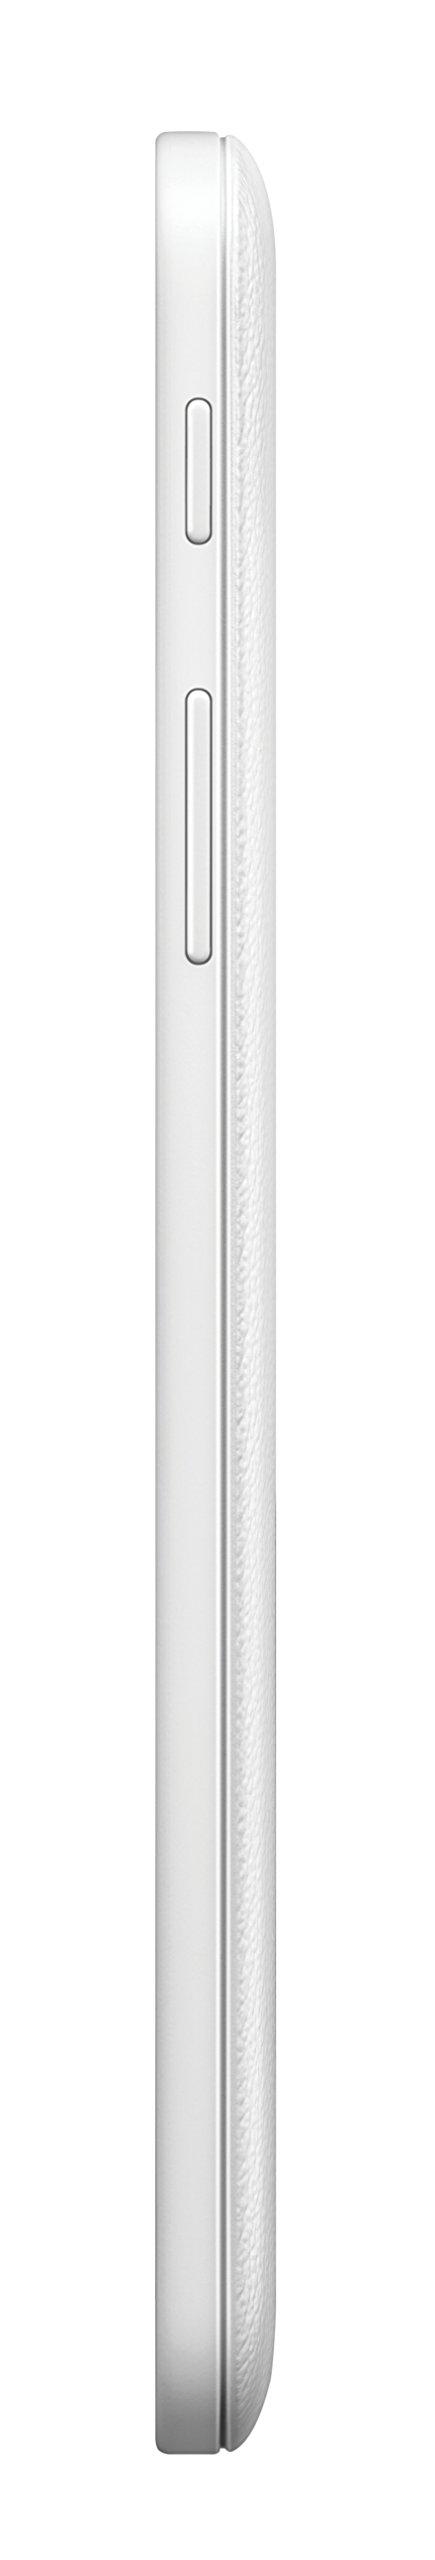 Samsung Galaxy Tab E Lite 7''; 8 GB Wifi Tablet (White) SM-T113NDWAXAR by Samsung (Image #5)